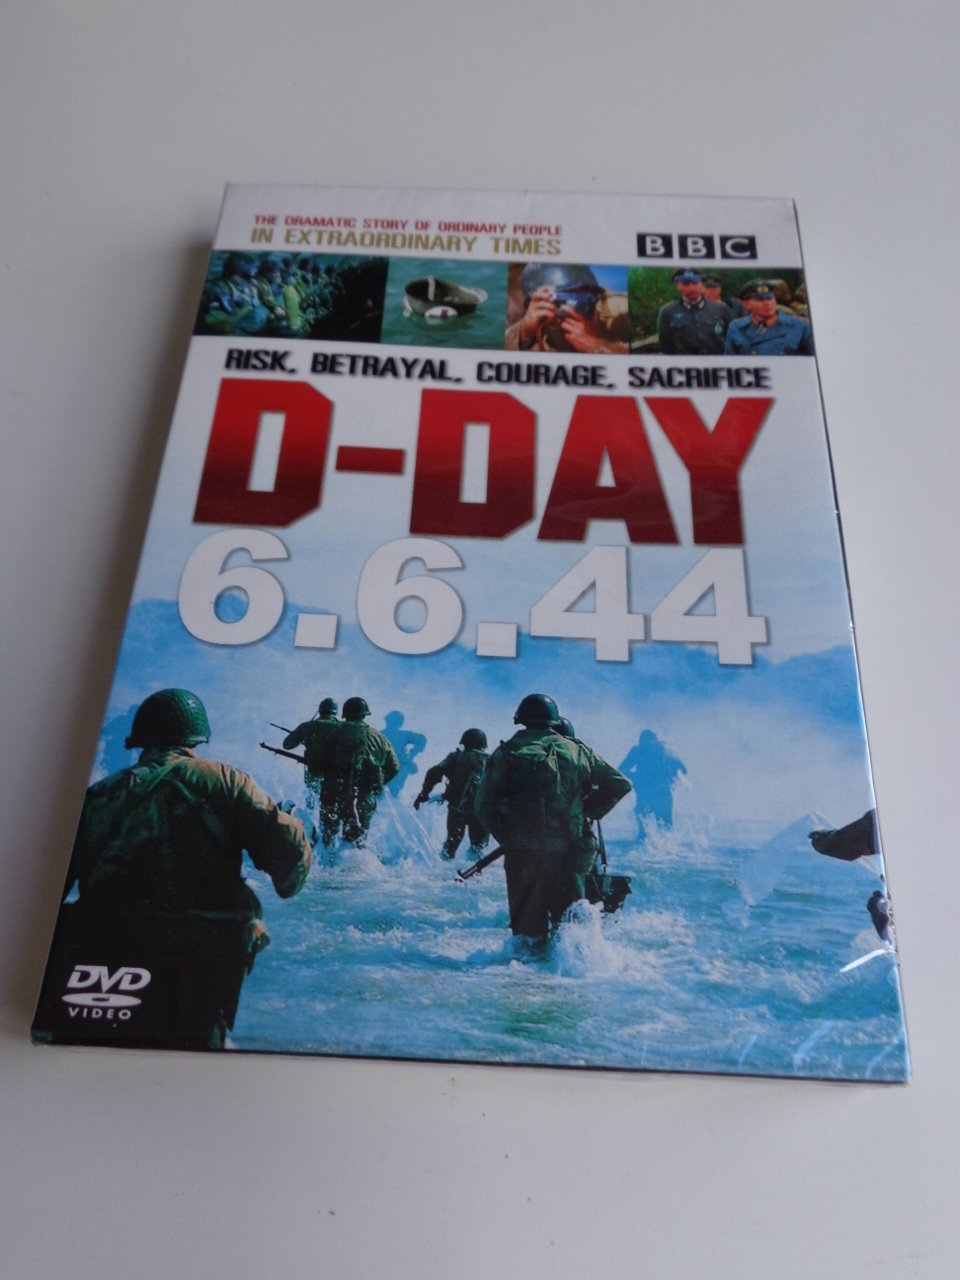 Amazon.com: D-Day 6.6.44 BBC Documentary / Region Free PAL DVD / Audio: English, Thai / Subtitles: Thai: Movies & TV